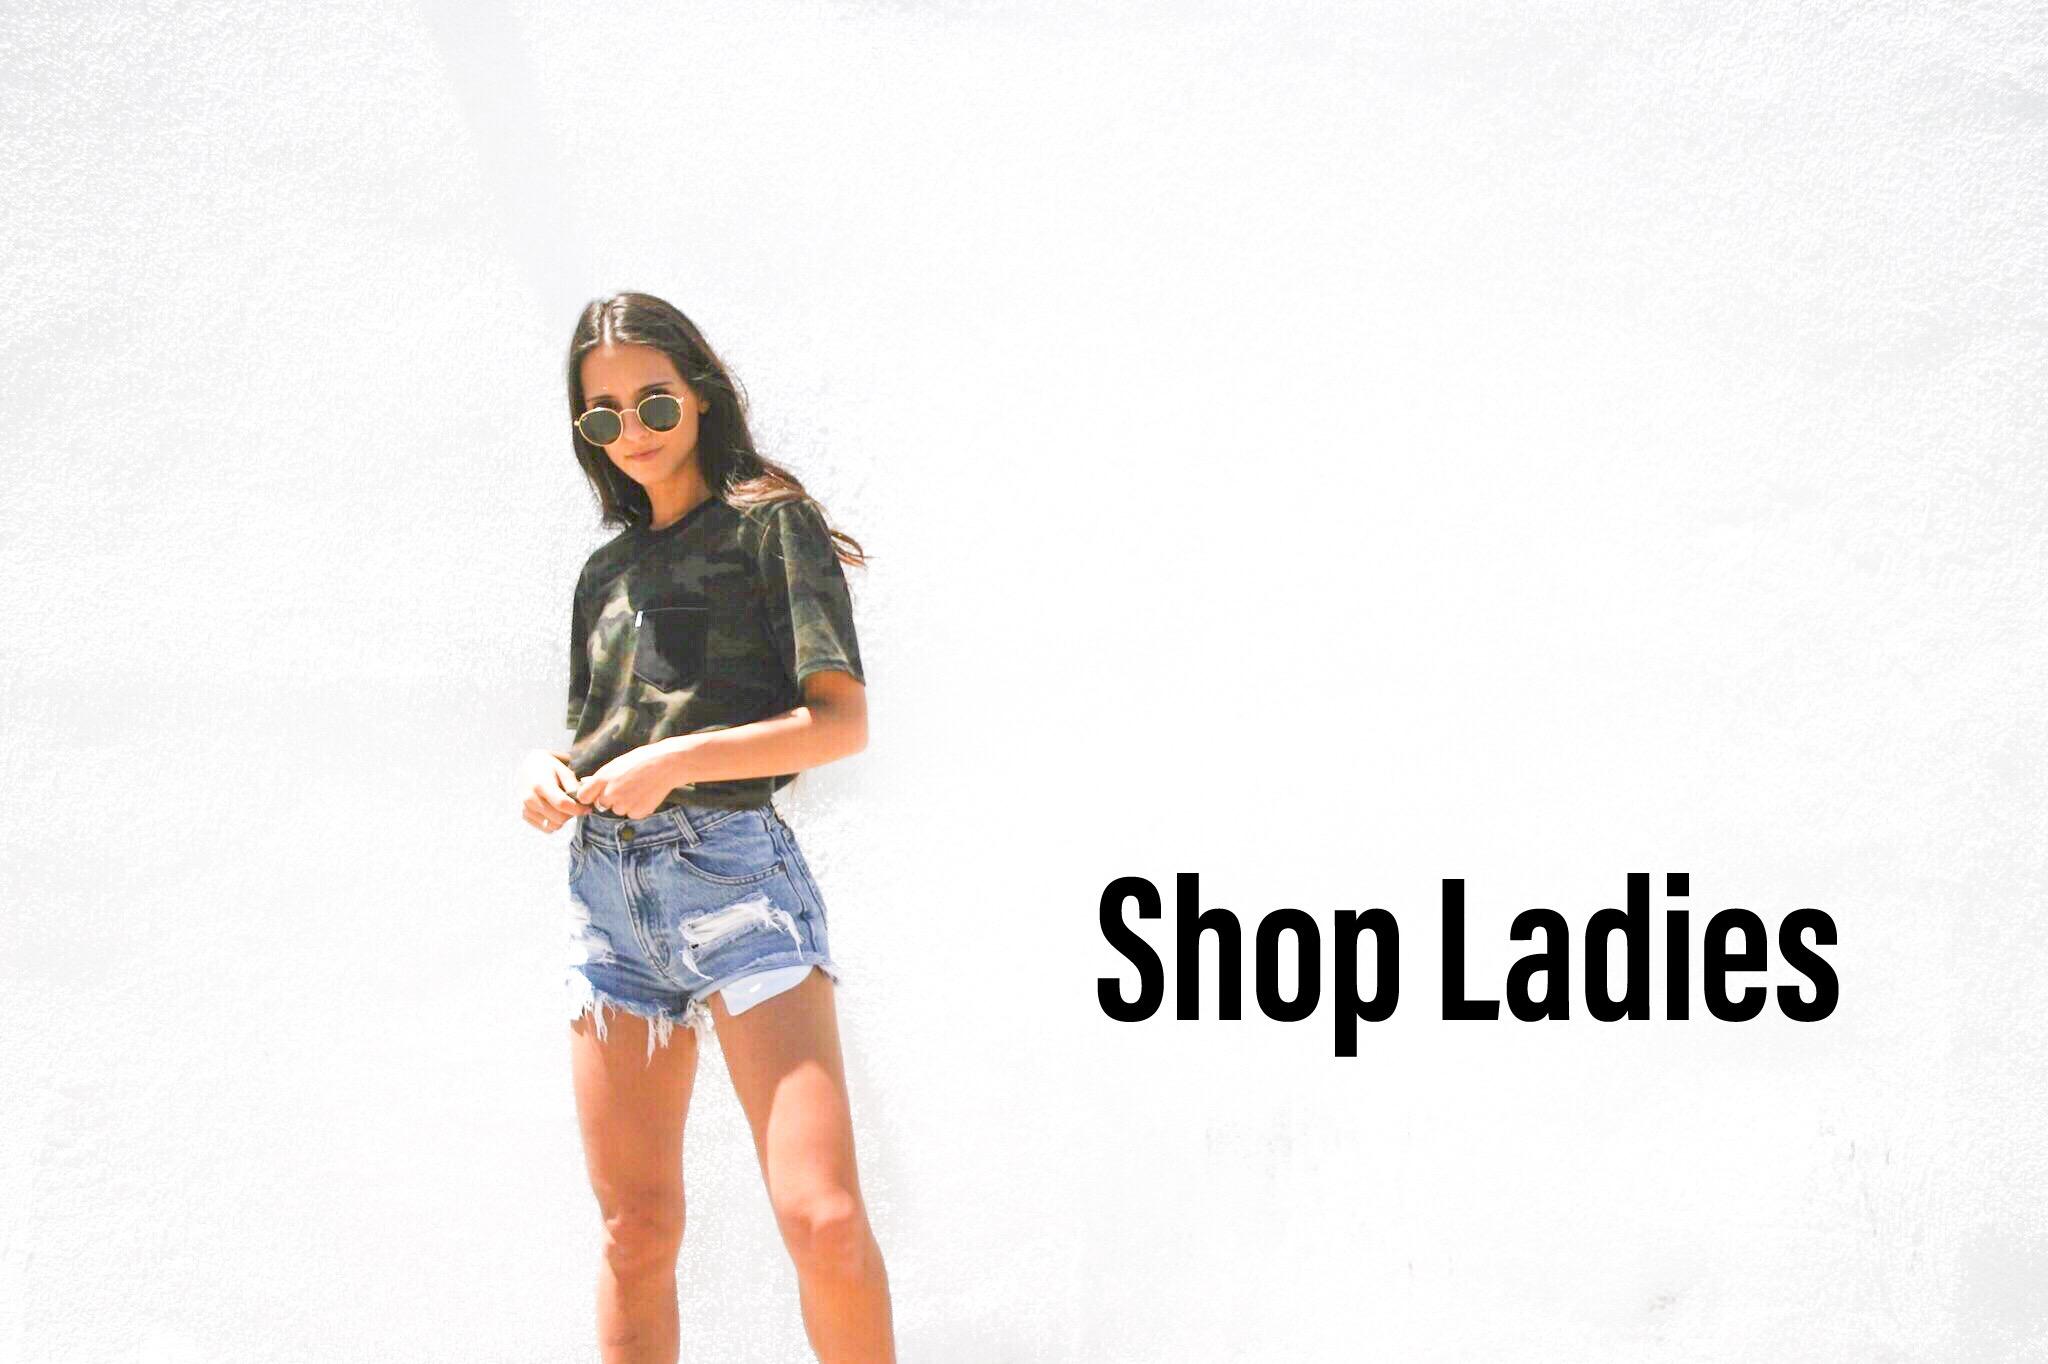 shop ladies.JPEG